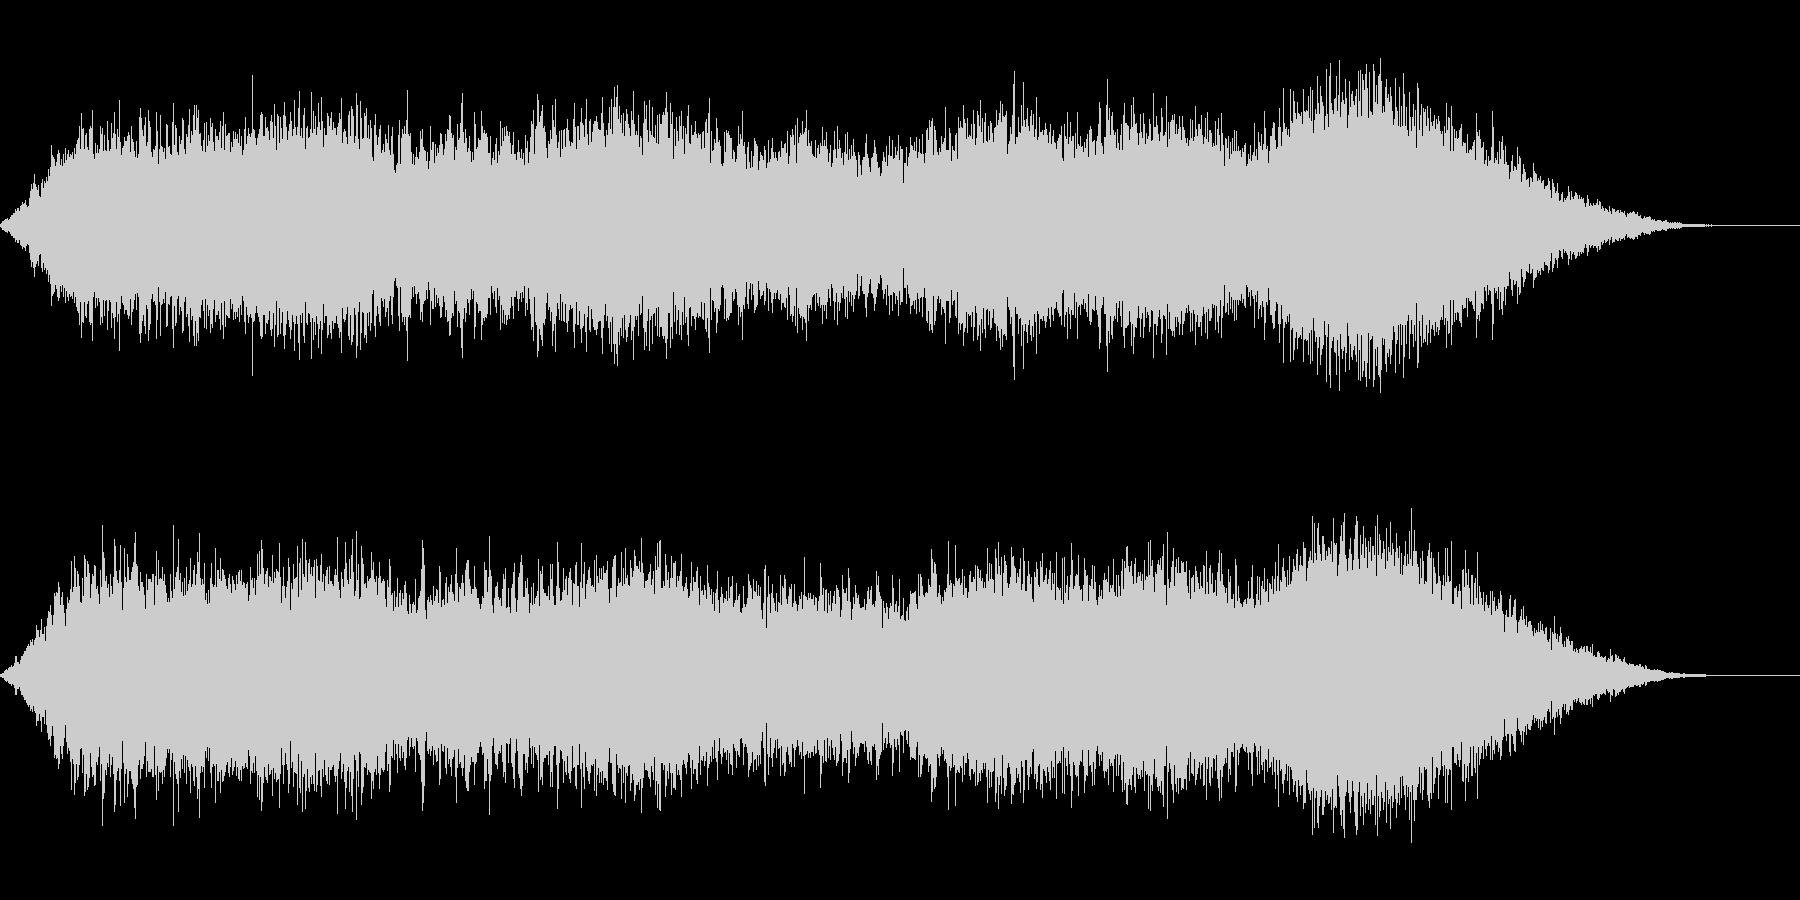 Dark_Attack-28の未再生の波形